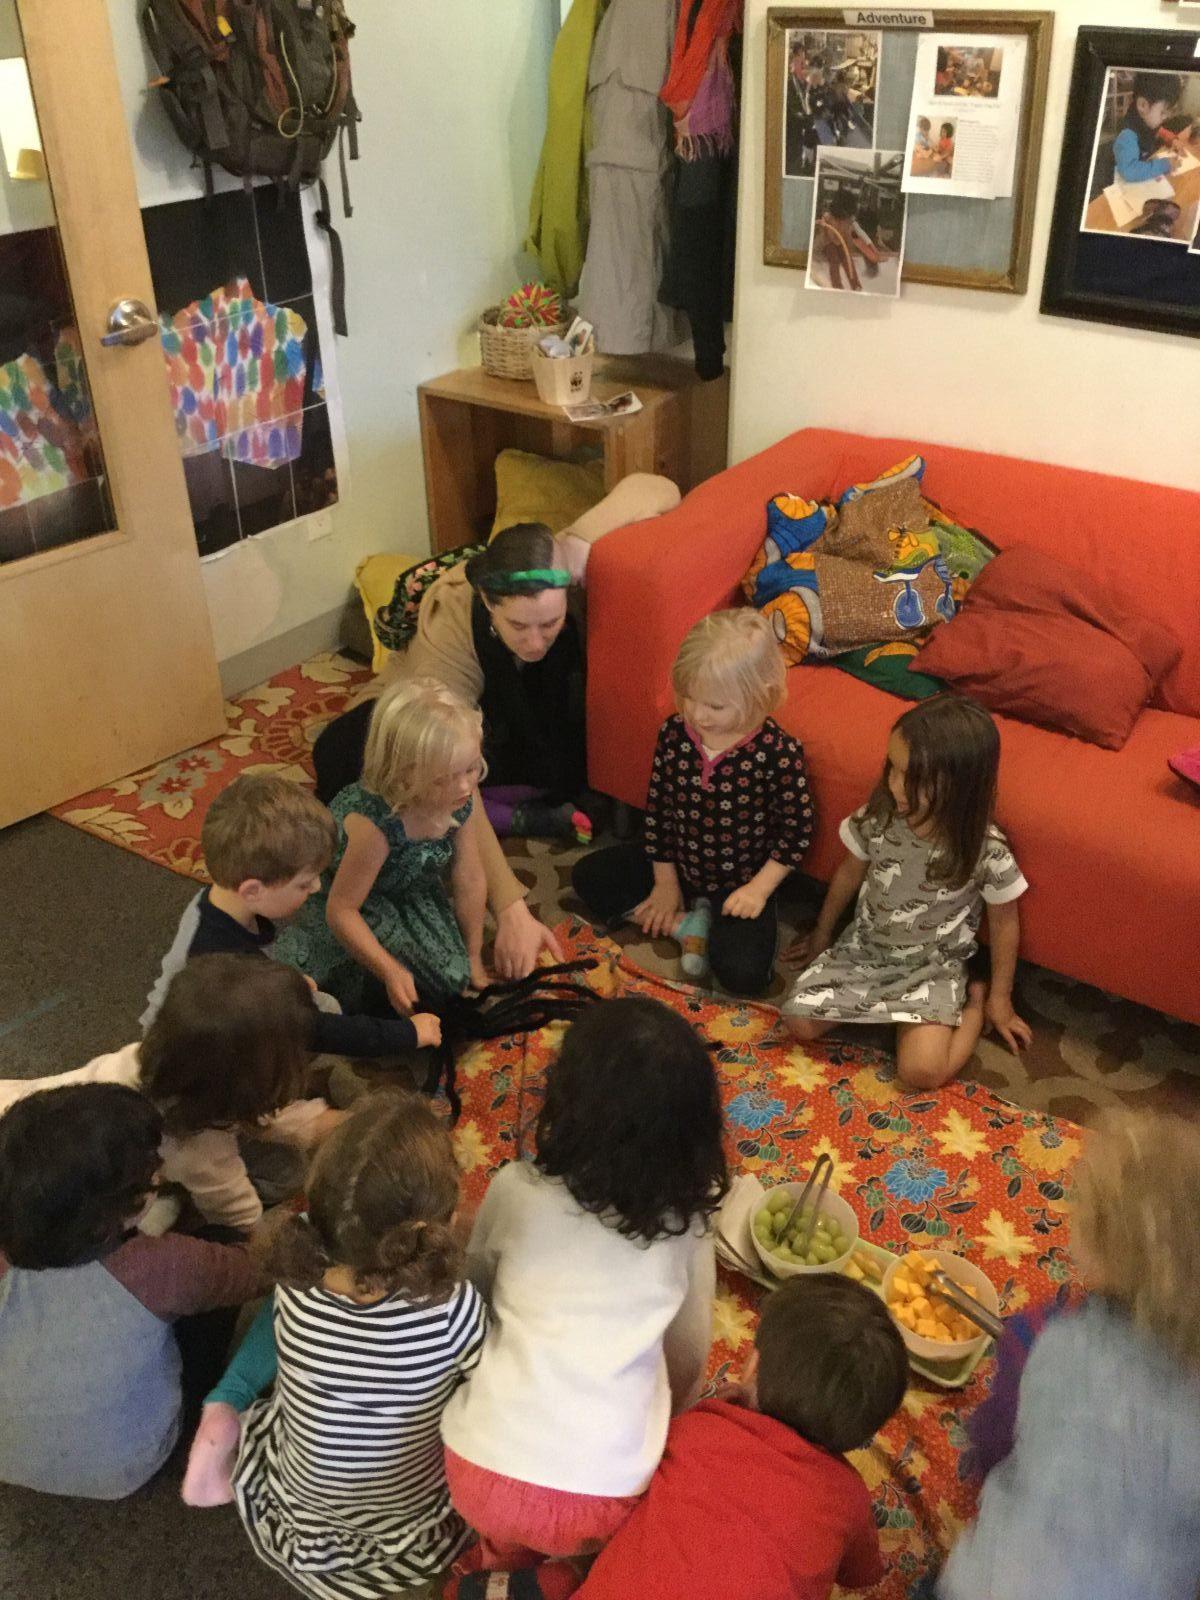 Children watching an electronic spider crawl